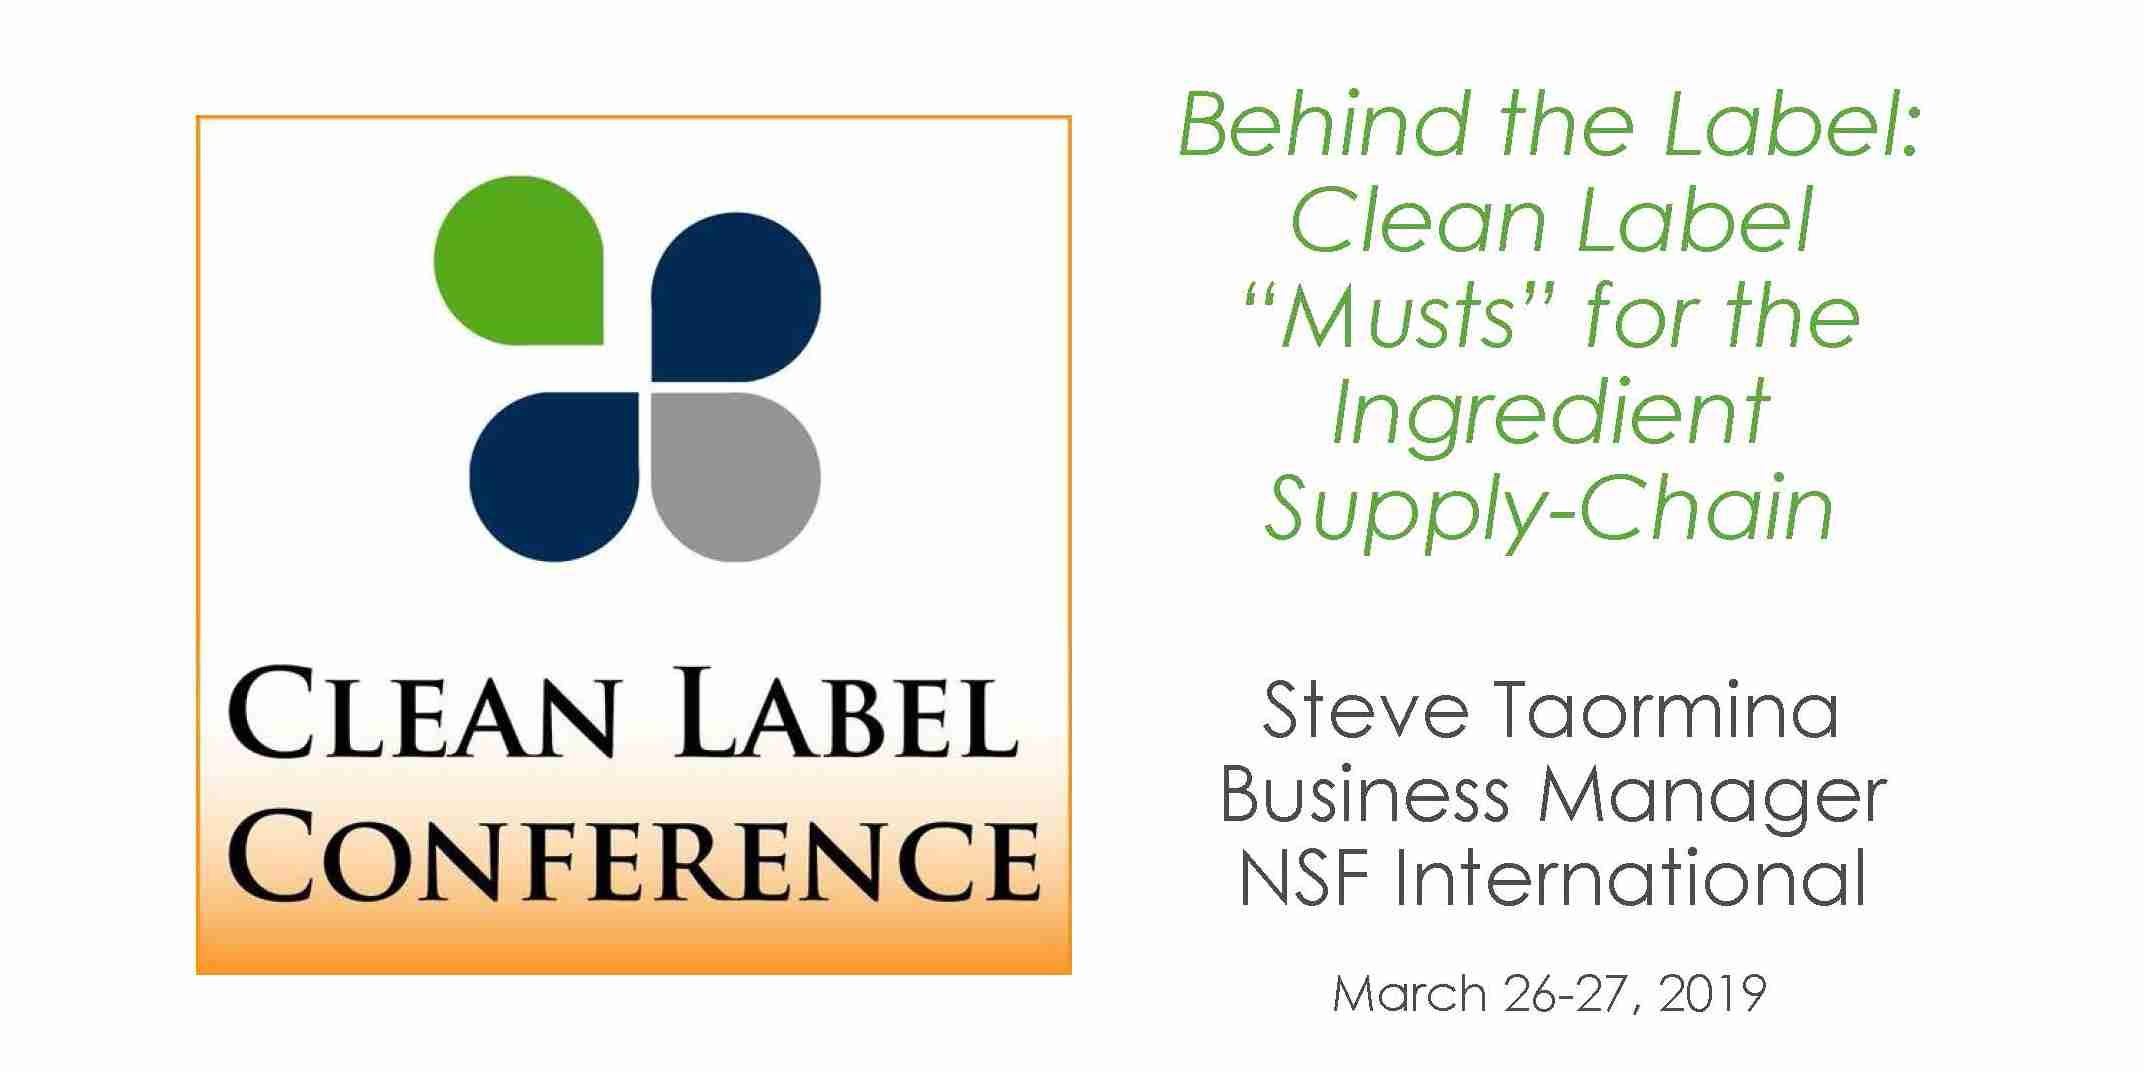 Steve Taormina-Clean Label Ingredient Supply Chain 2019 CLC